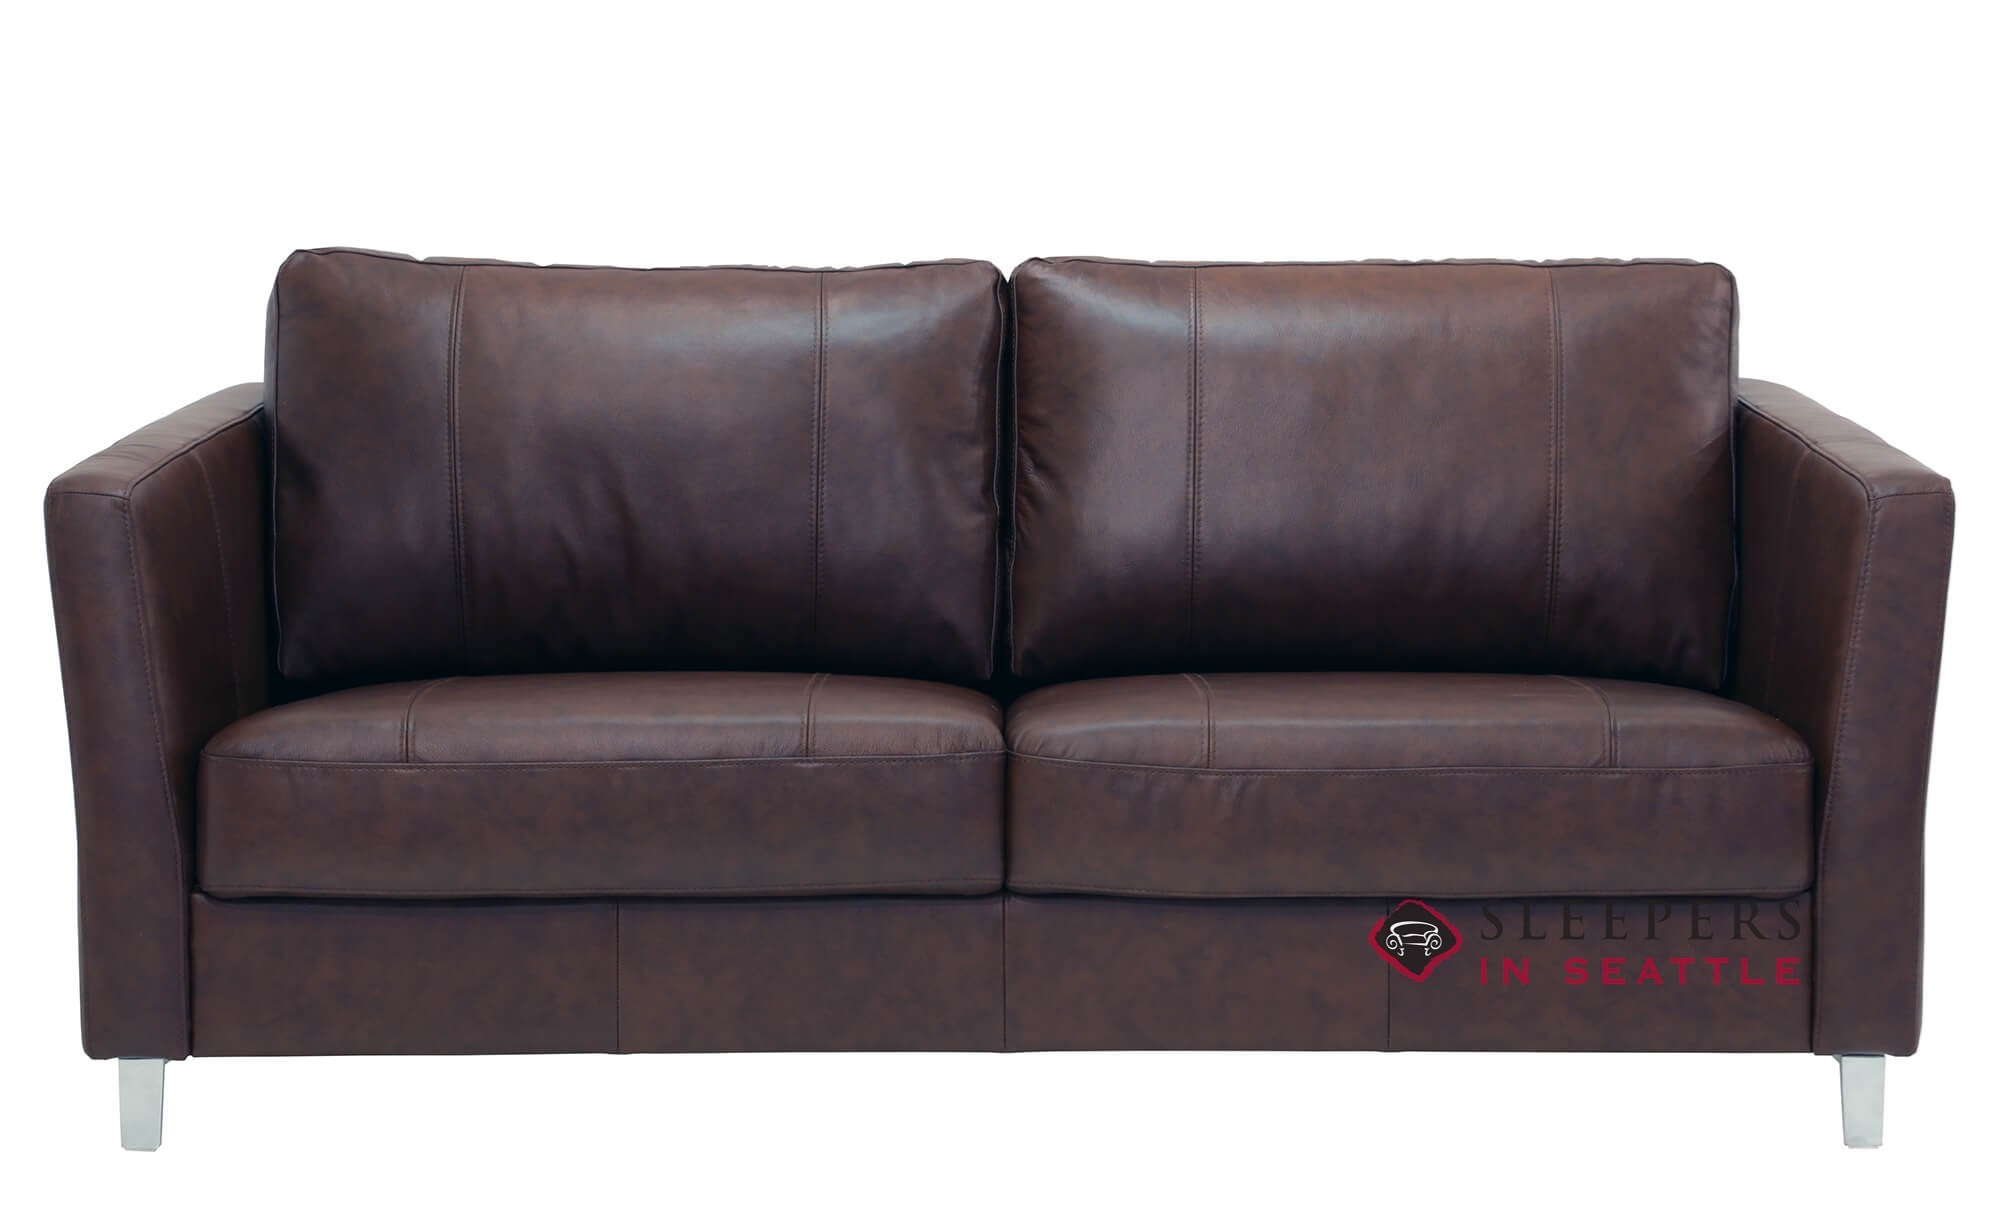 Luonto Monika Queen Leather Sleeper Sofa